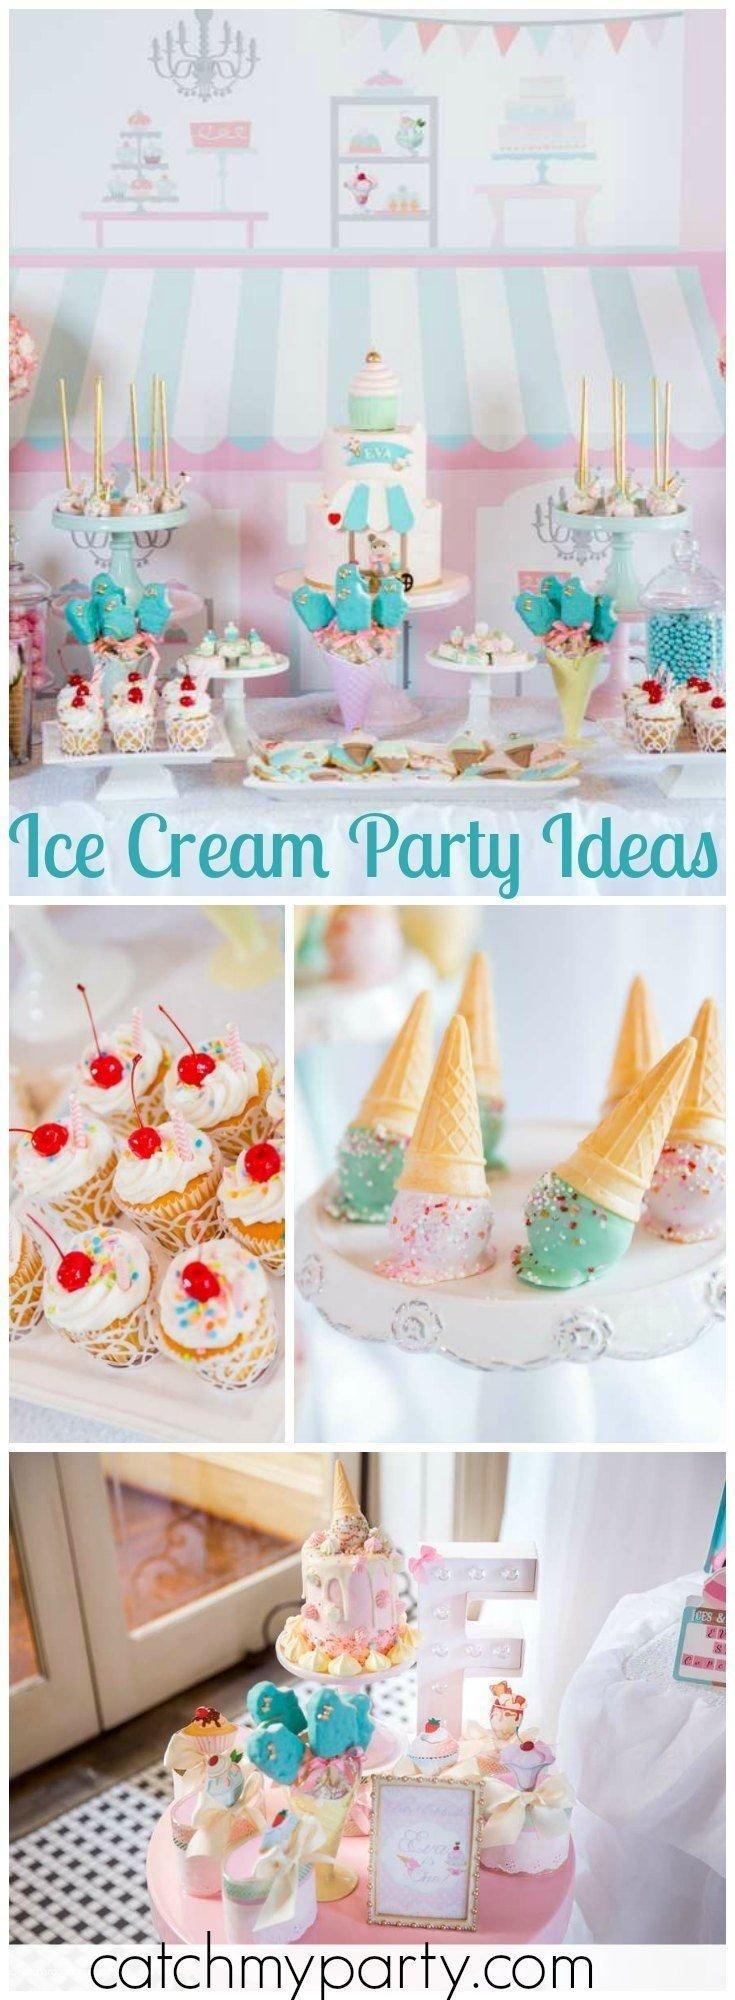 10 Fabulous Ice Cream Birthday Party Ideas 411 best ice cream party ideas images on pinterest birthdays 2020